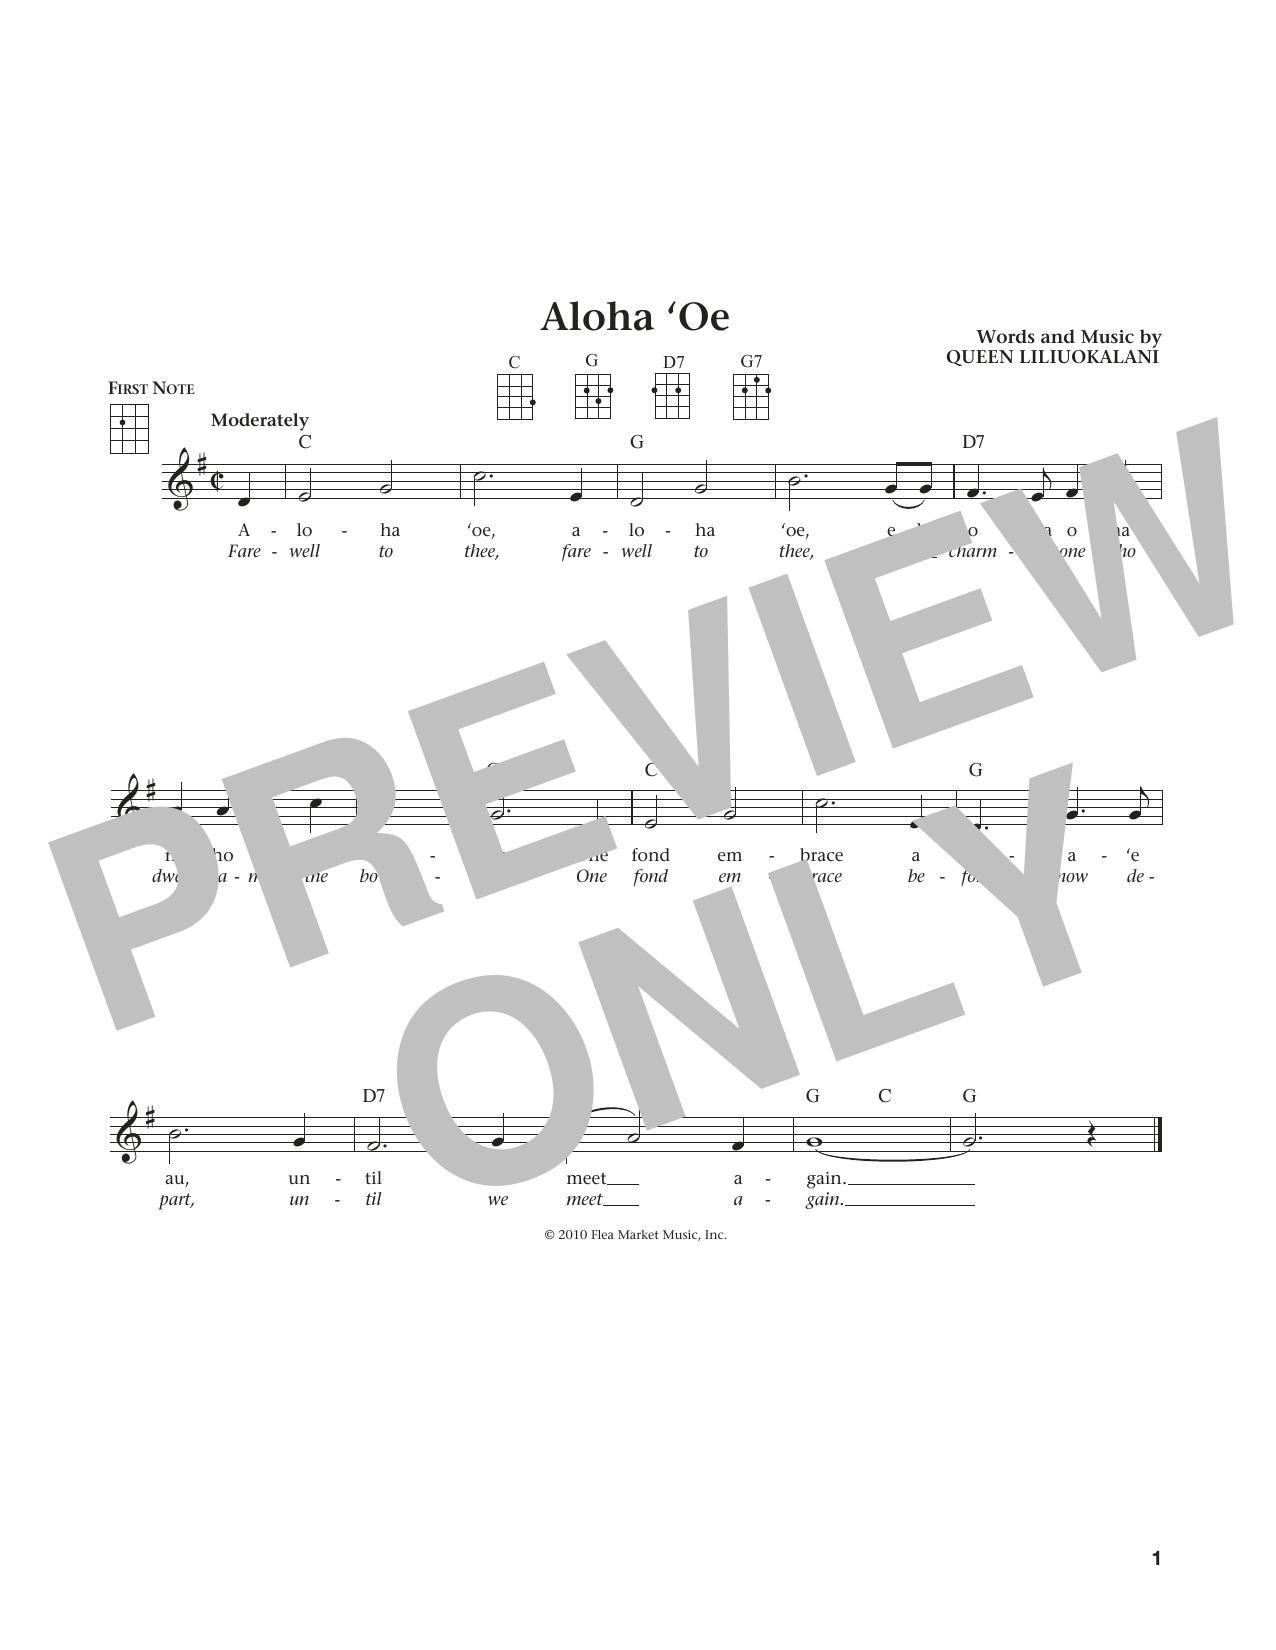 Aloha Oe (from The Daily Ukulele) (arr. Liz and Jim Beloff) (Ukulele)